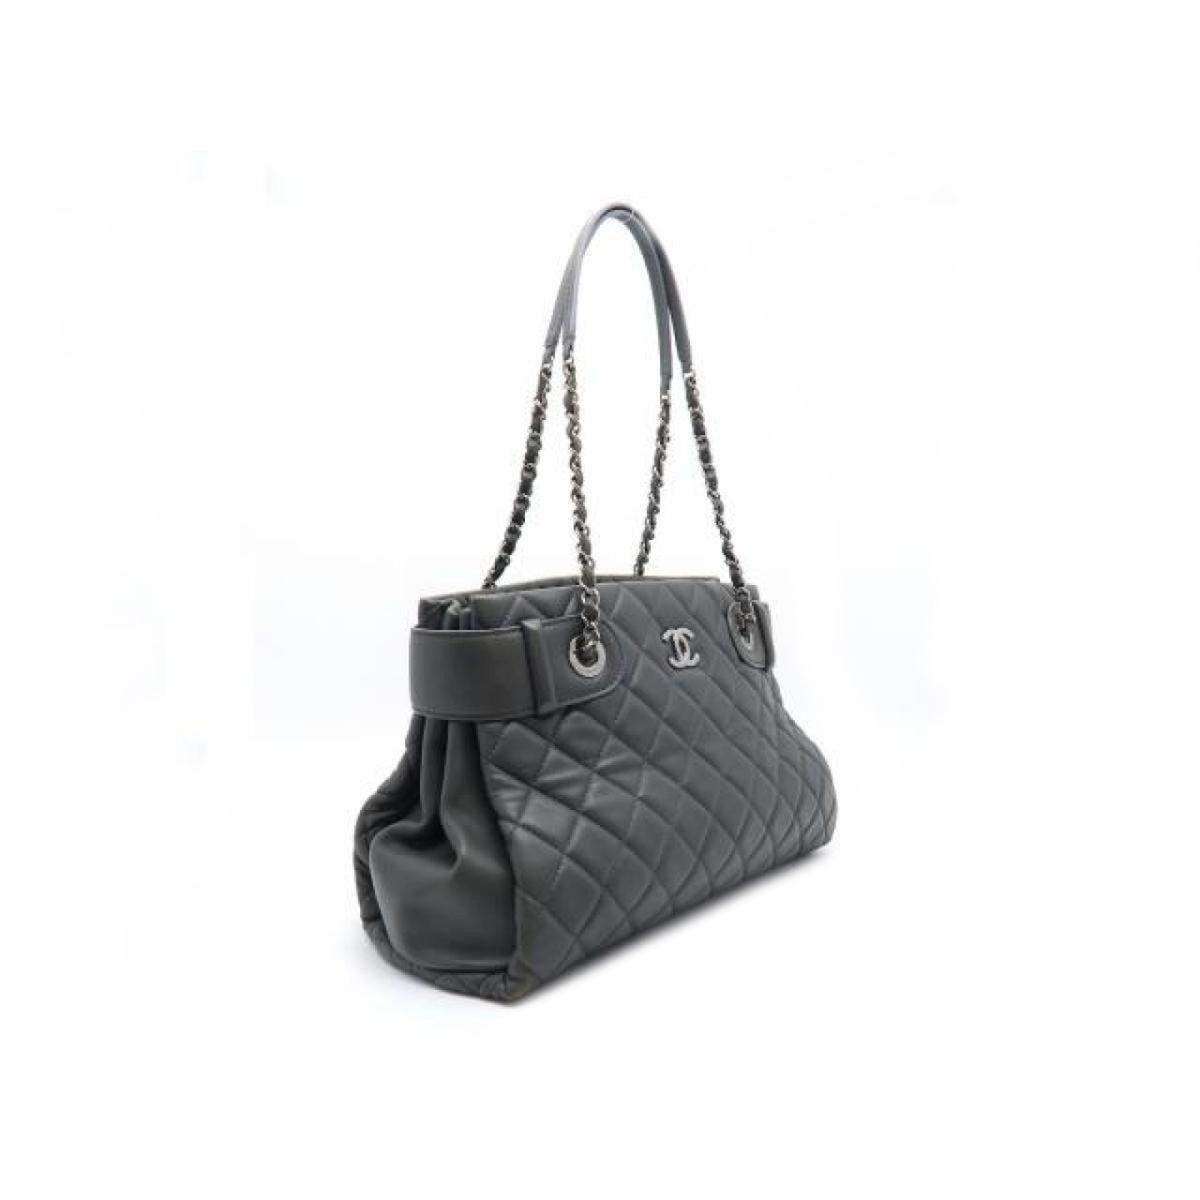 ac524fb5f5cb Chanel - Cc Mark Stitch Shw Chain Tote Shoulder Bag Lamb Leather Gray Used  Vintage -. View fullscreen